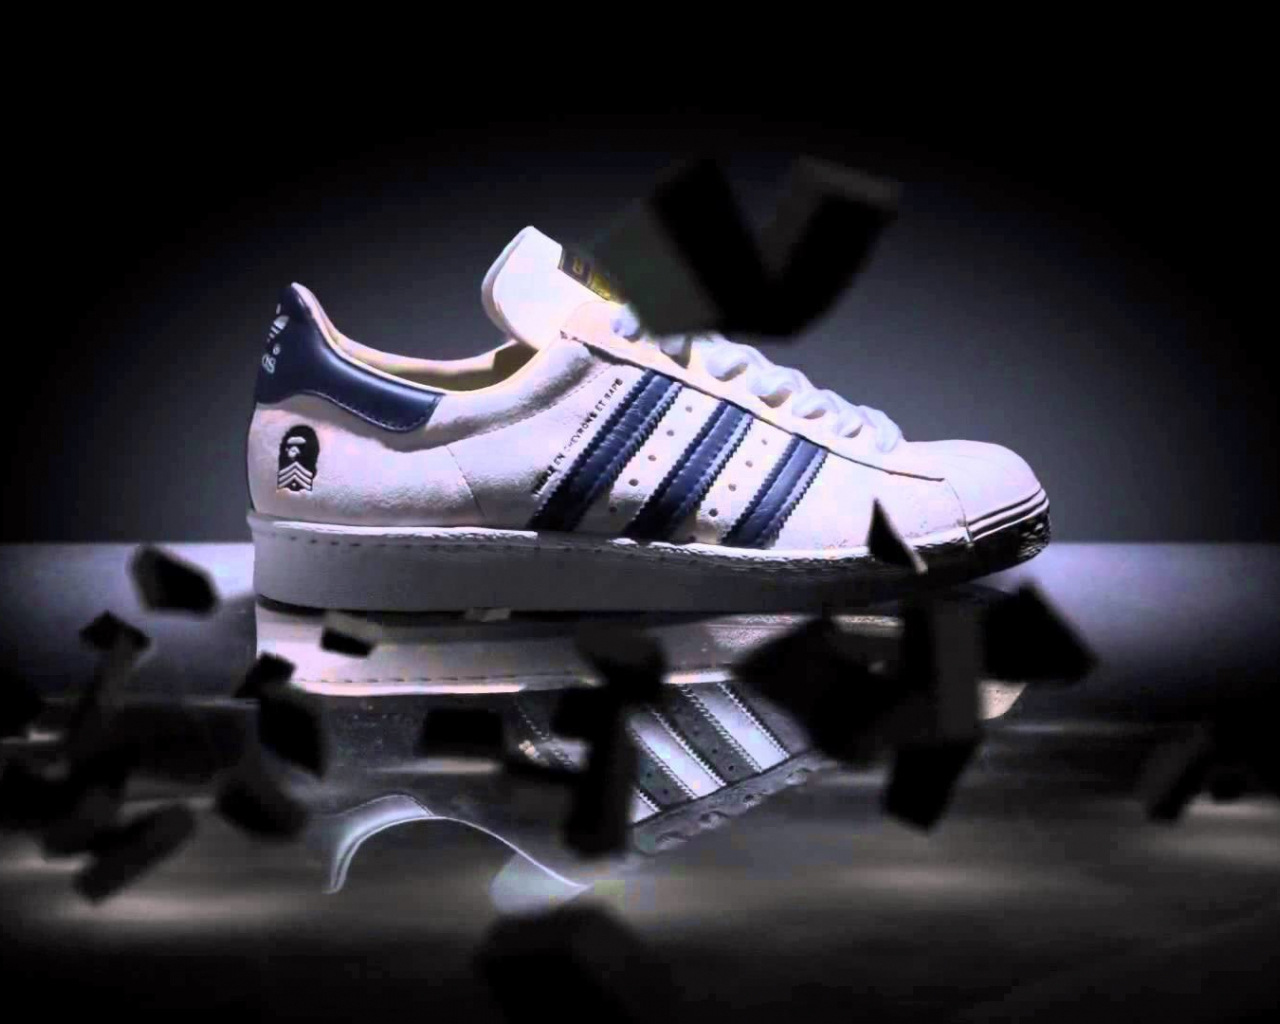 64 Adidas Originals Wallpapers